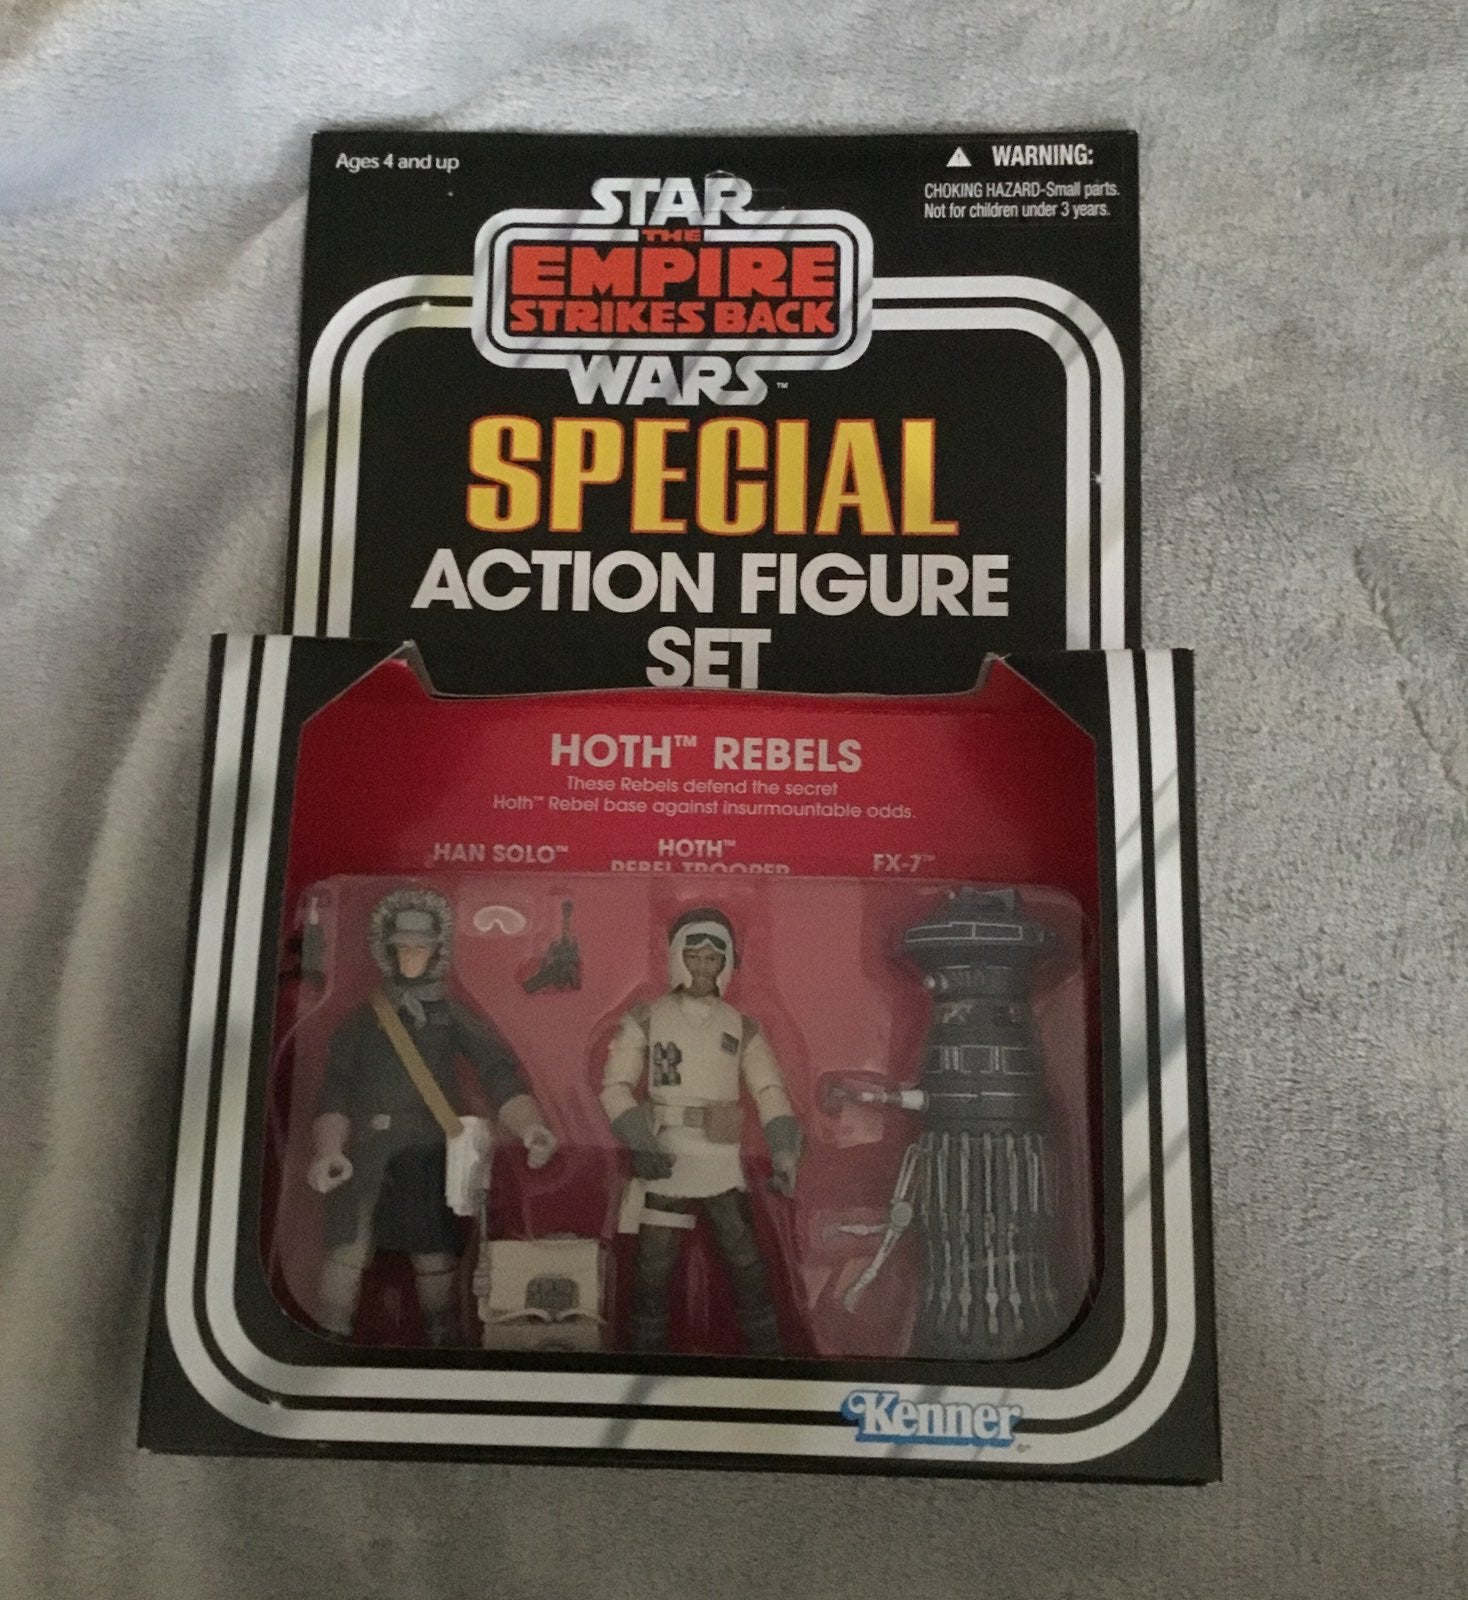 Star Wars Hoth Rebels set